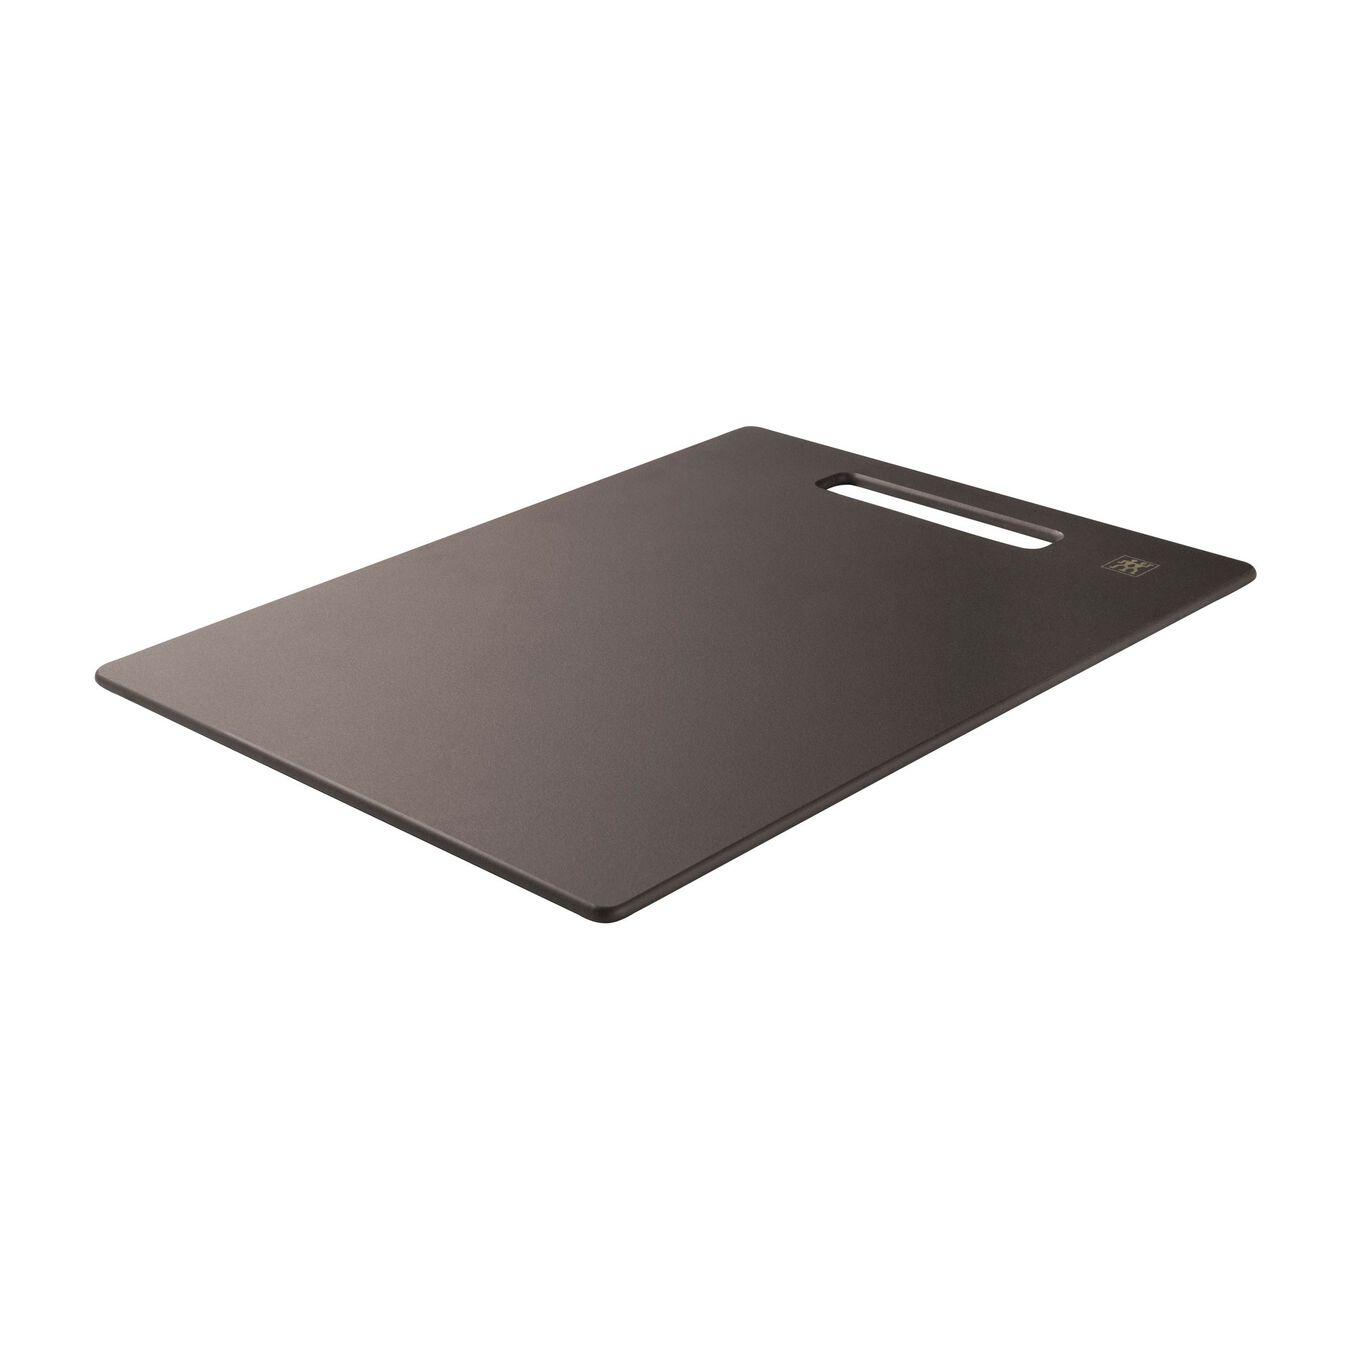 Cutting board 38 cm x 28 cm Fibre wood,,large 3